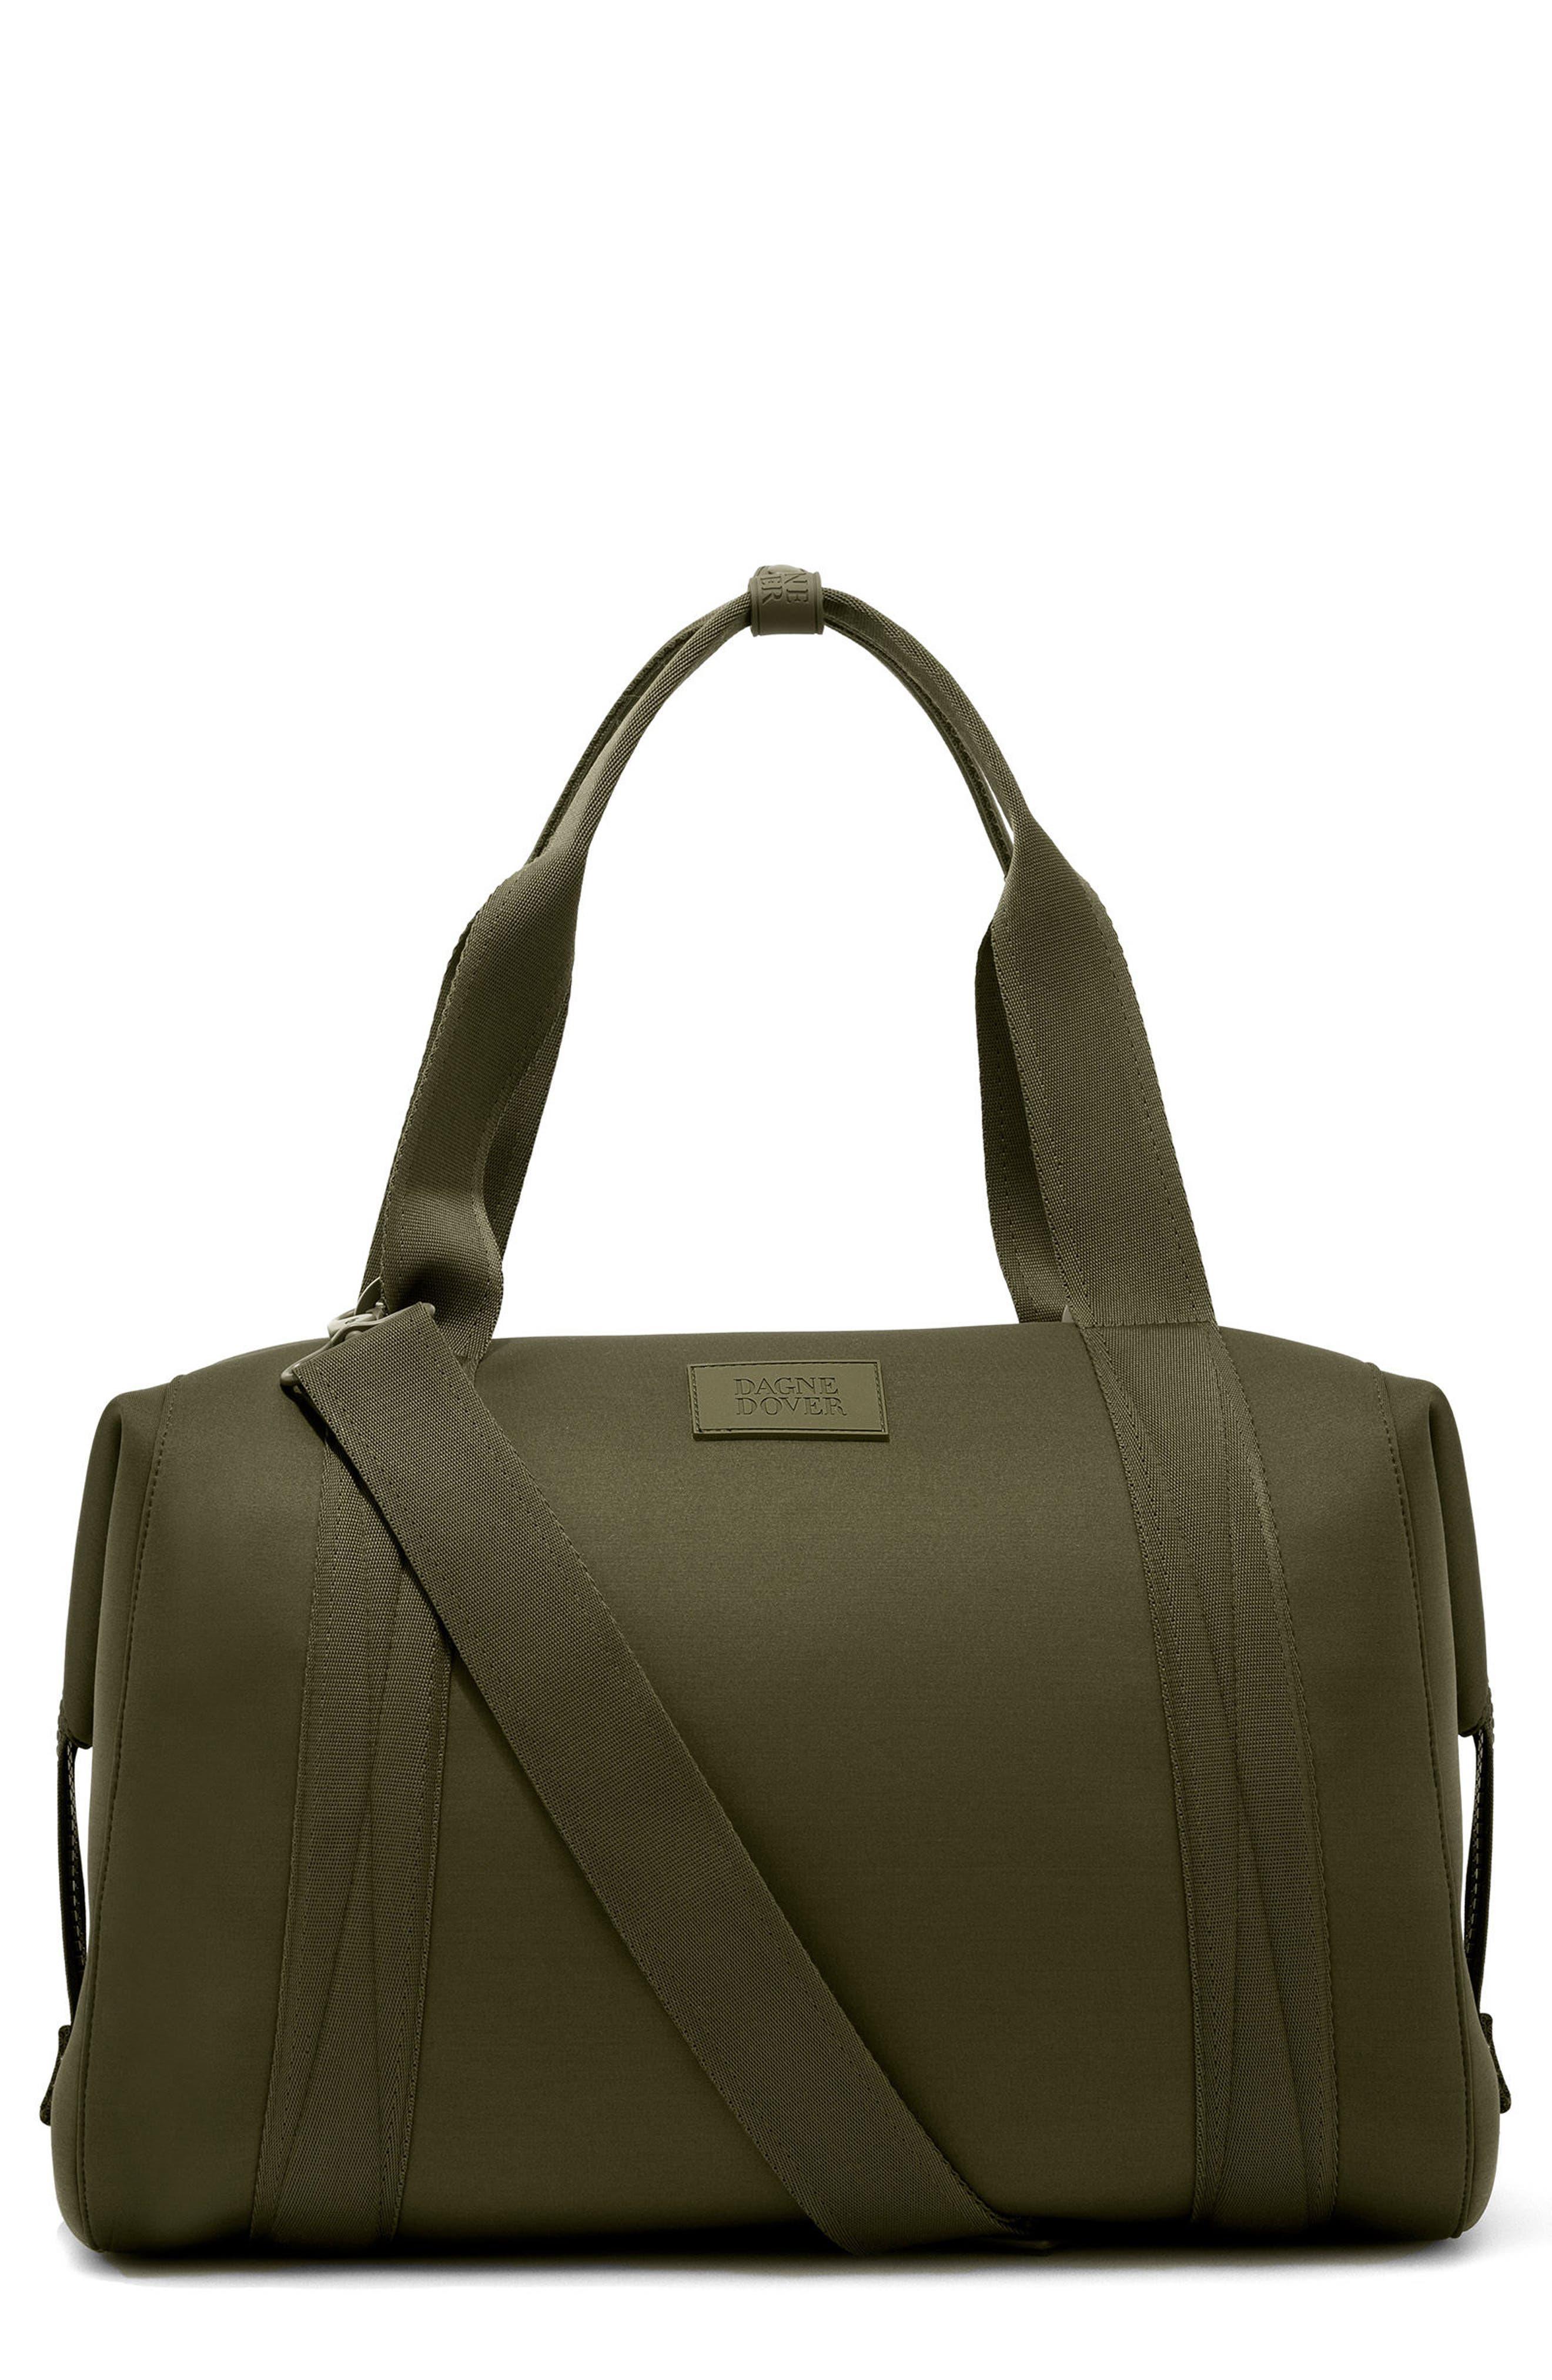 365 Large Landon Neoprene Carryall Duffel Bag,                             Main thumbnail 4, color,